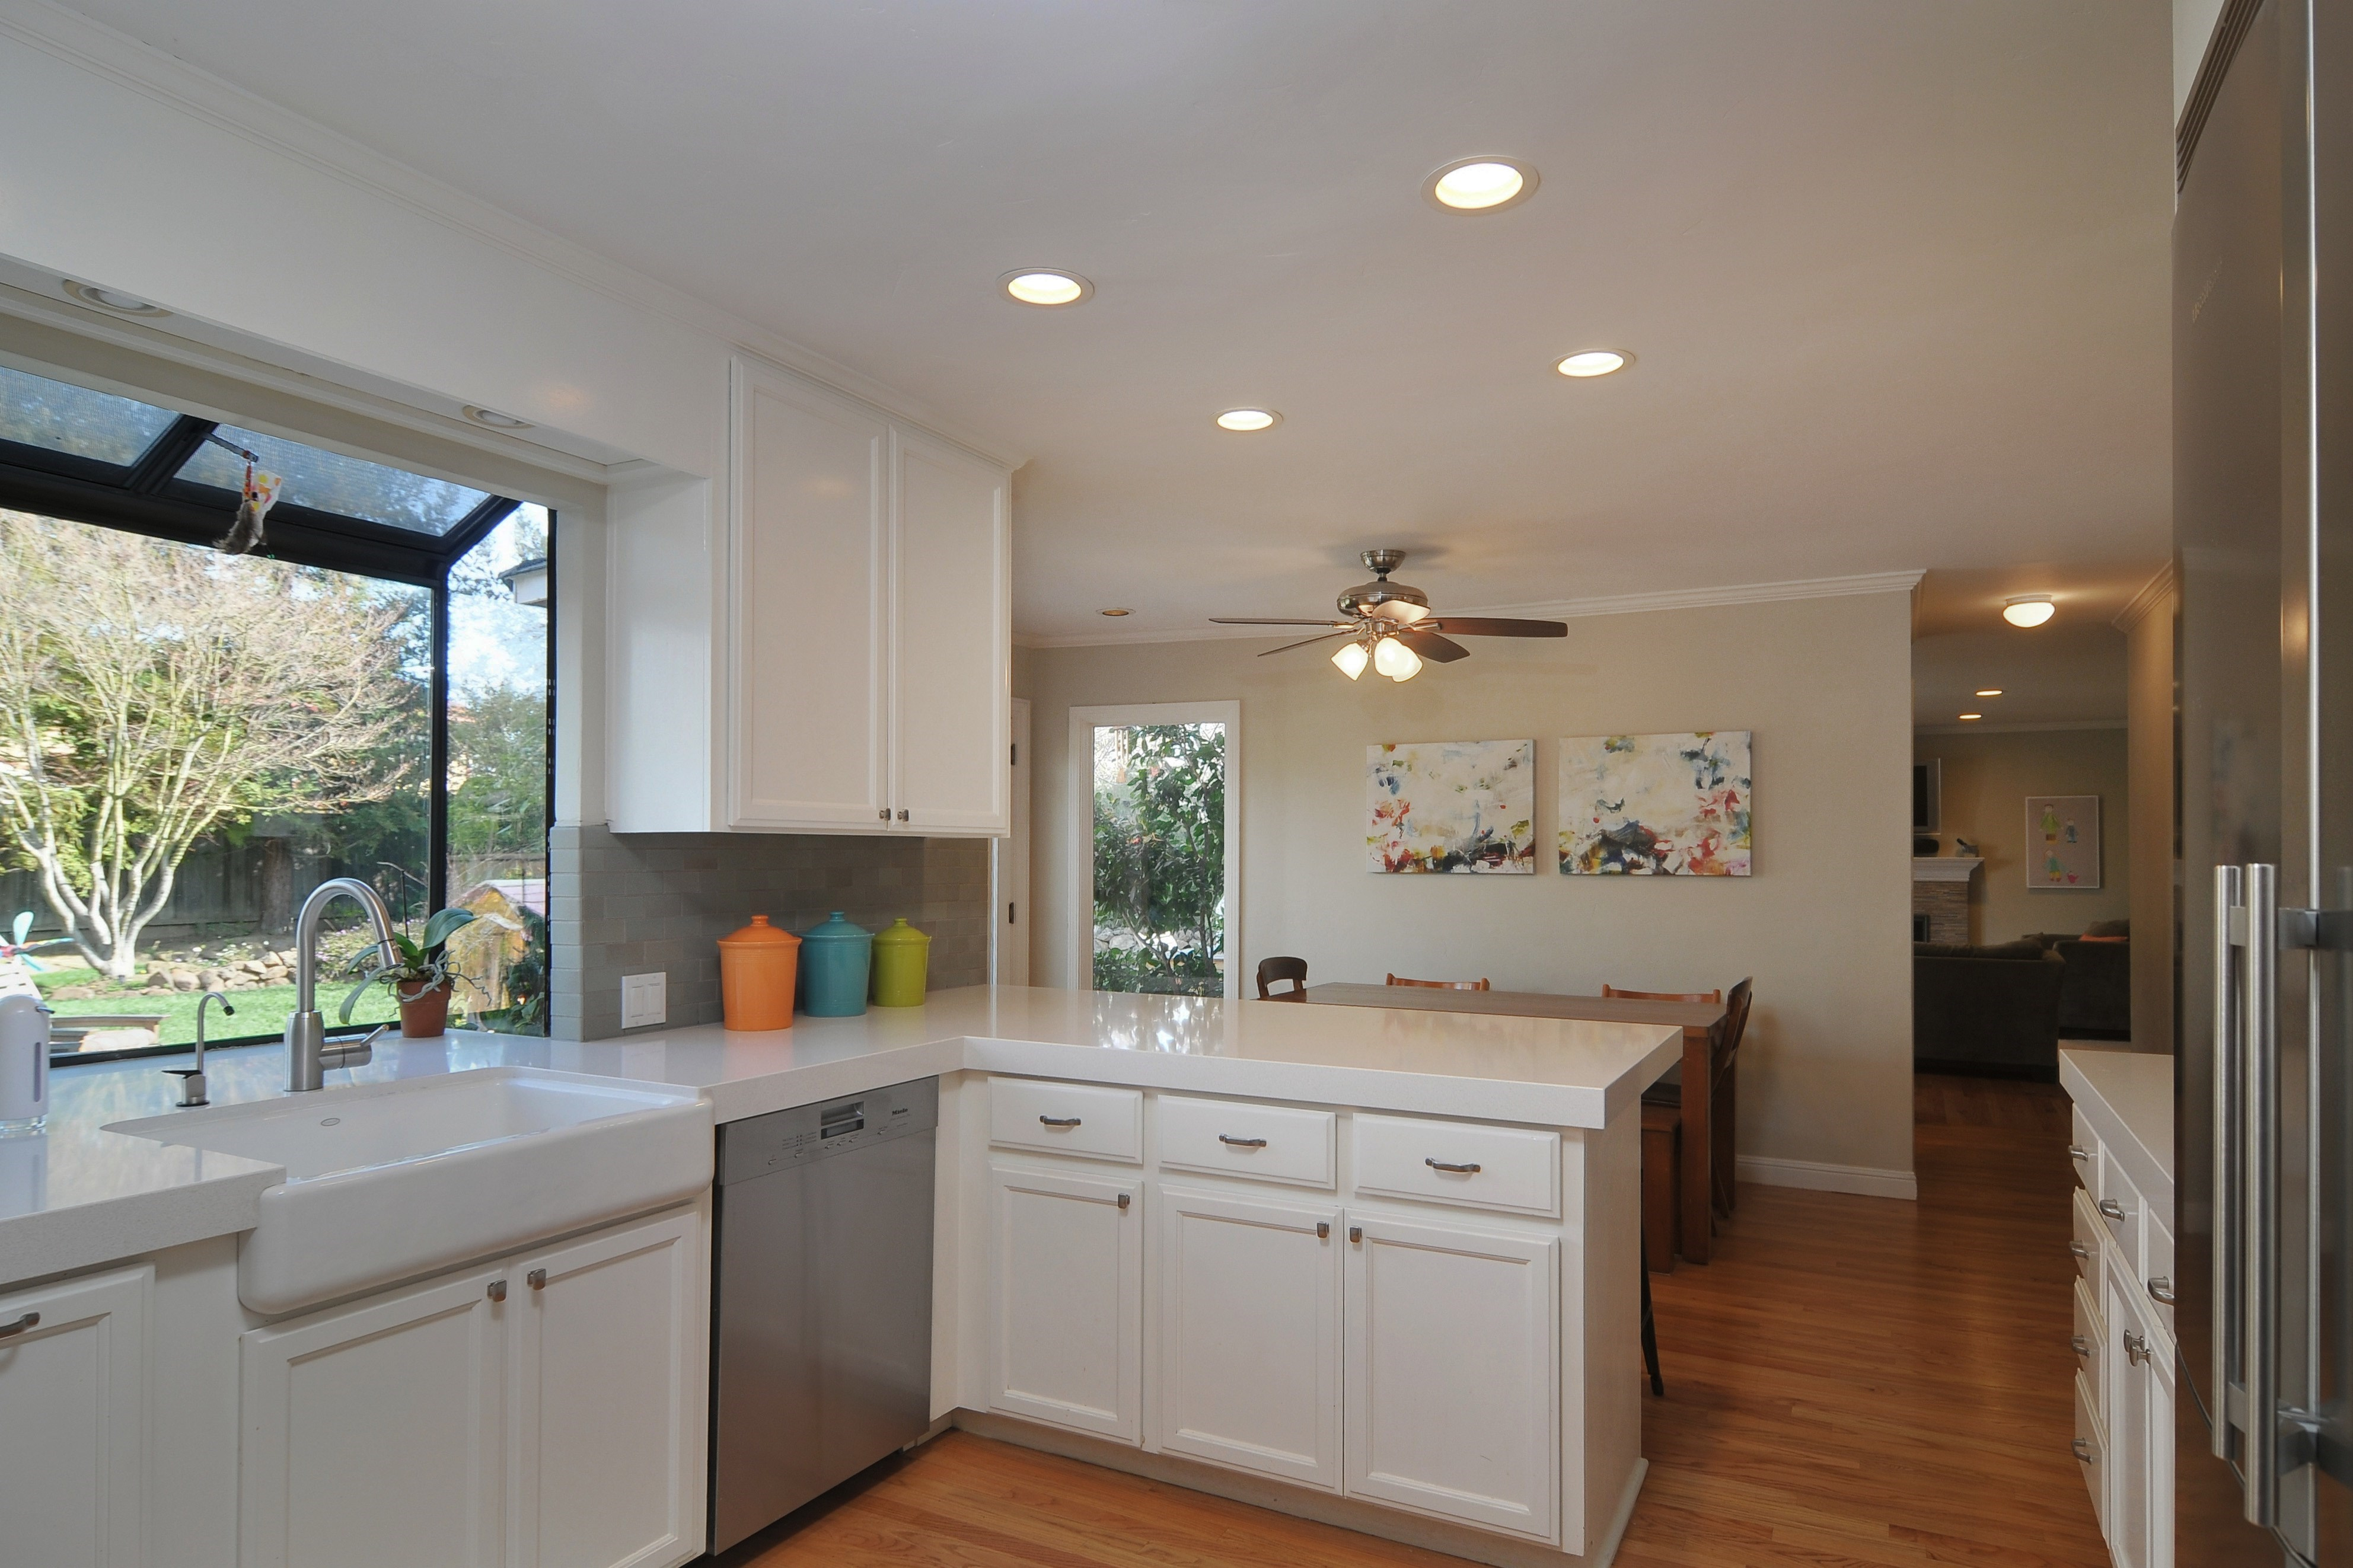 009 Kitchen 4 - Exquisite, expansive, remodeled Belwood home - 127 Belhaven Drive, Los Gatos